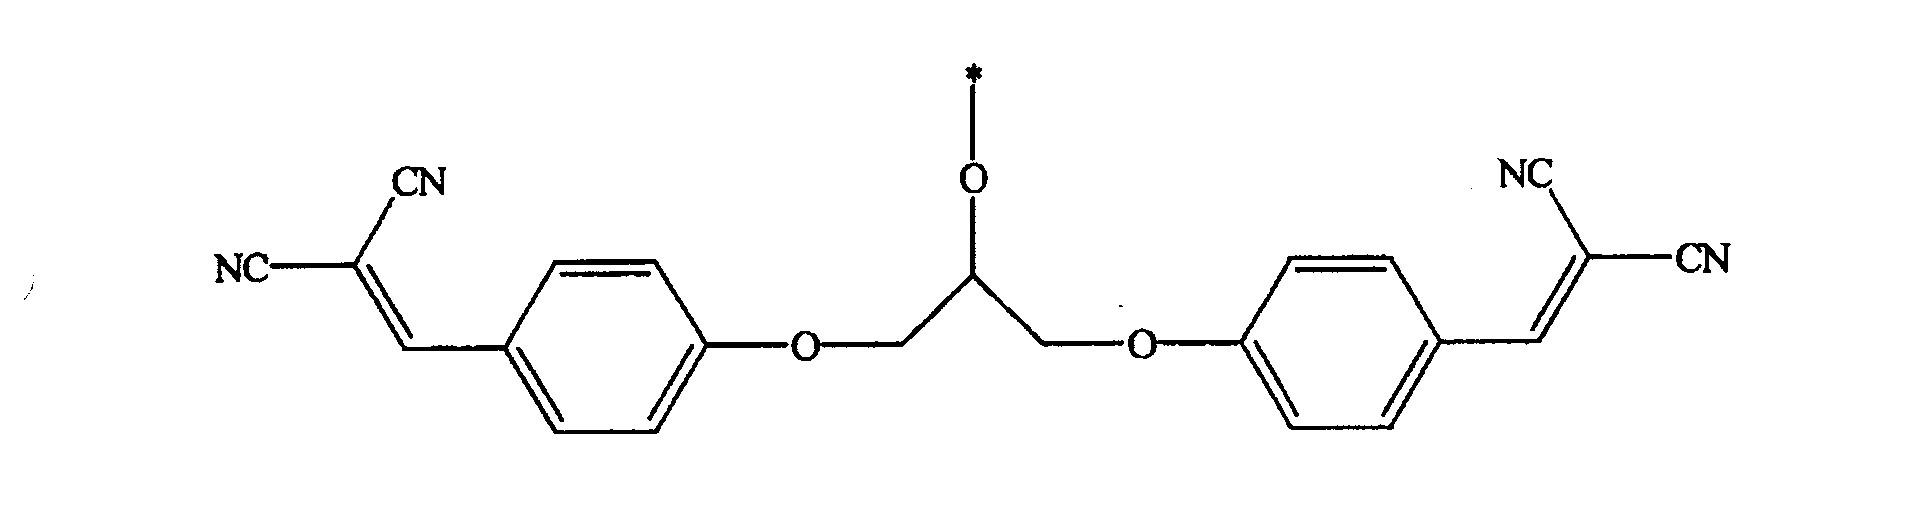 Figure 712011001004300-pct00046